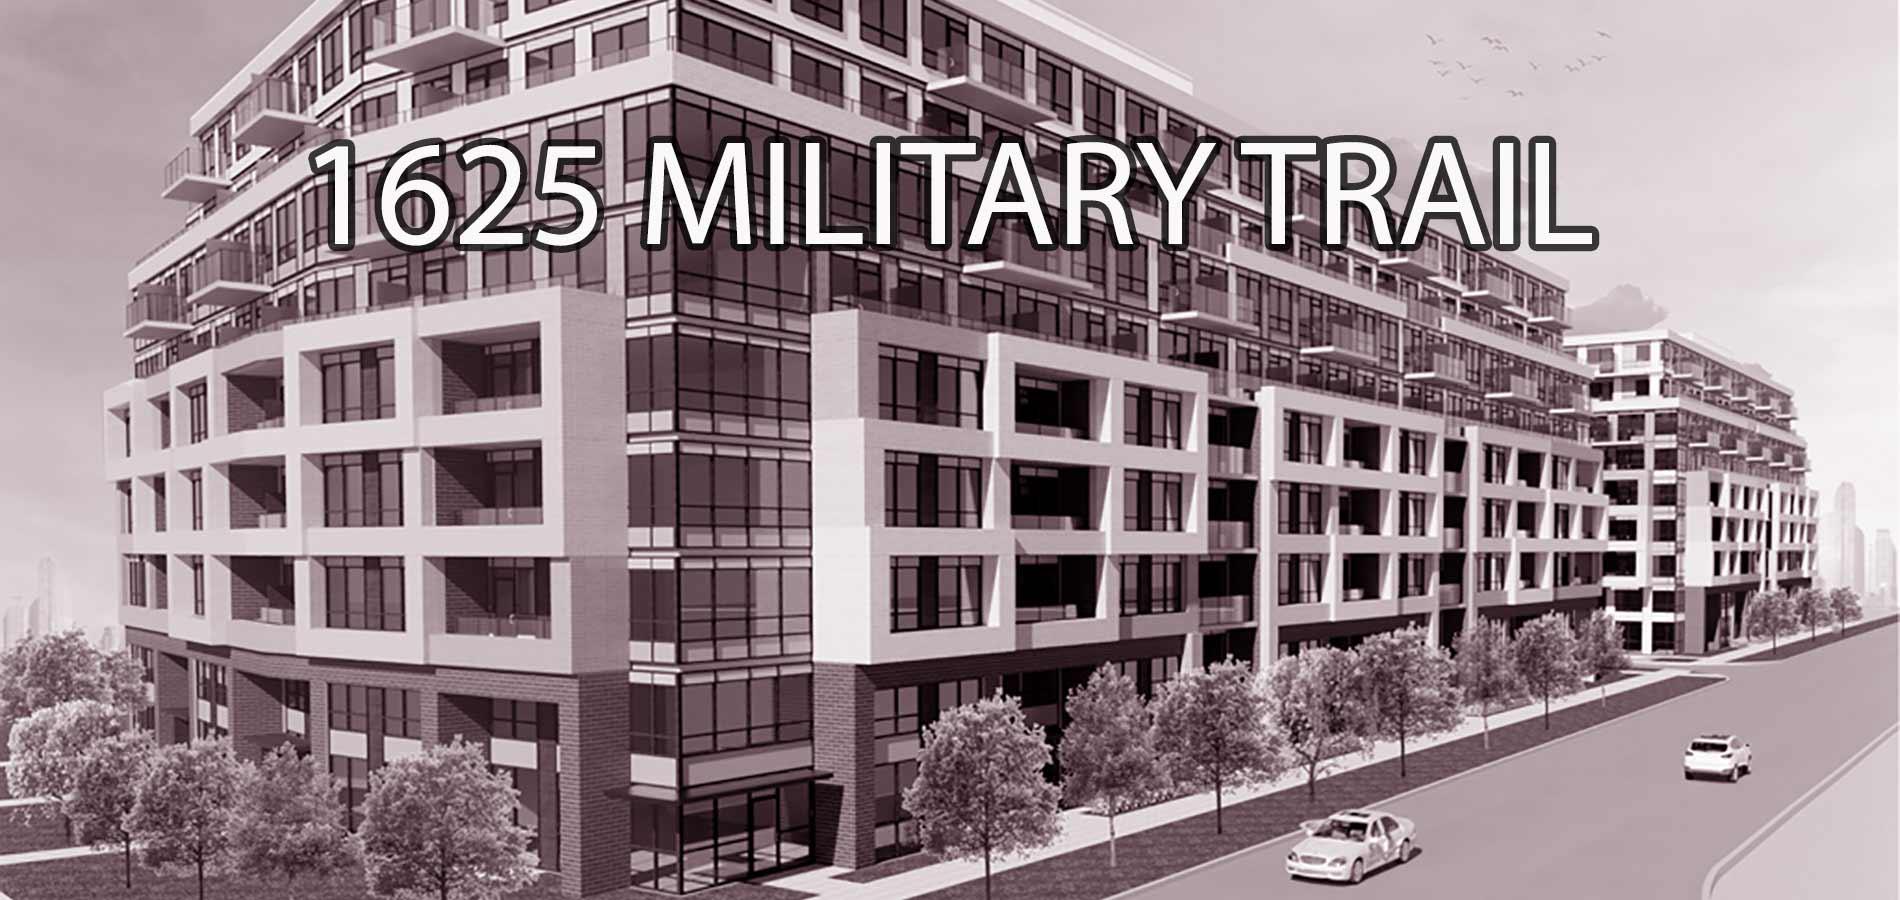 1625 Military Trail Condos